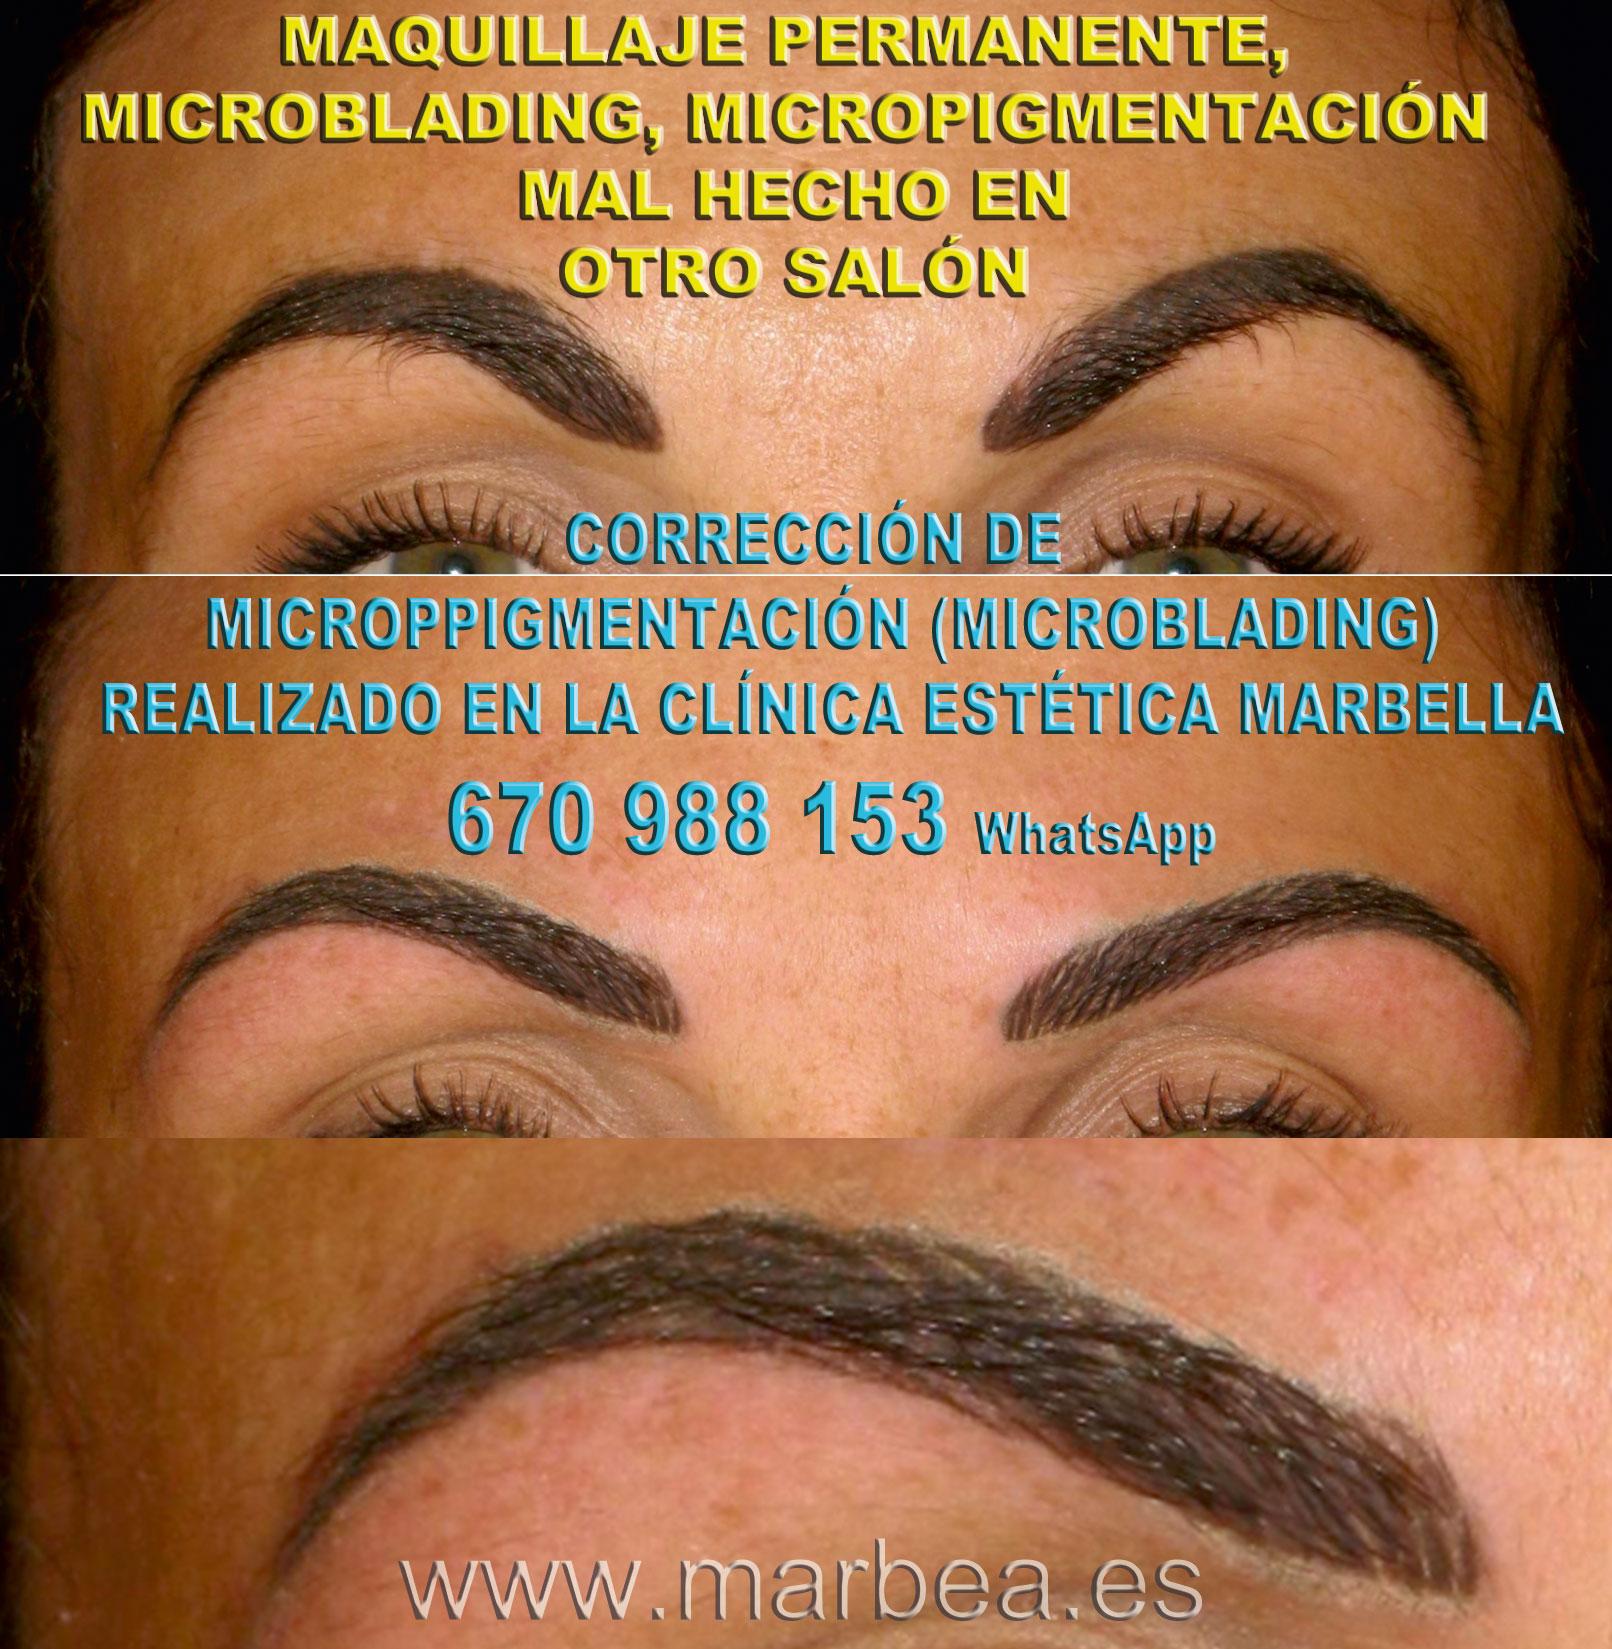 ELIMINAR MICROBLADING CEJAS clínica estética tatuaje entrega como aclarar la micropigmentación cejas,corregir micropigmentación no deseada